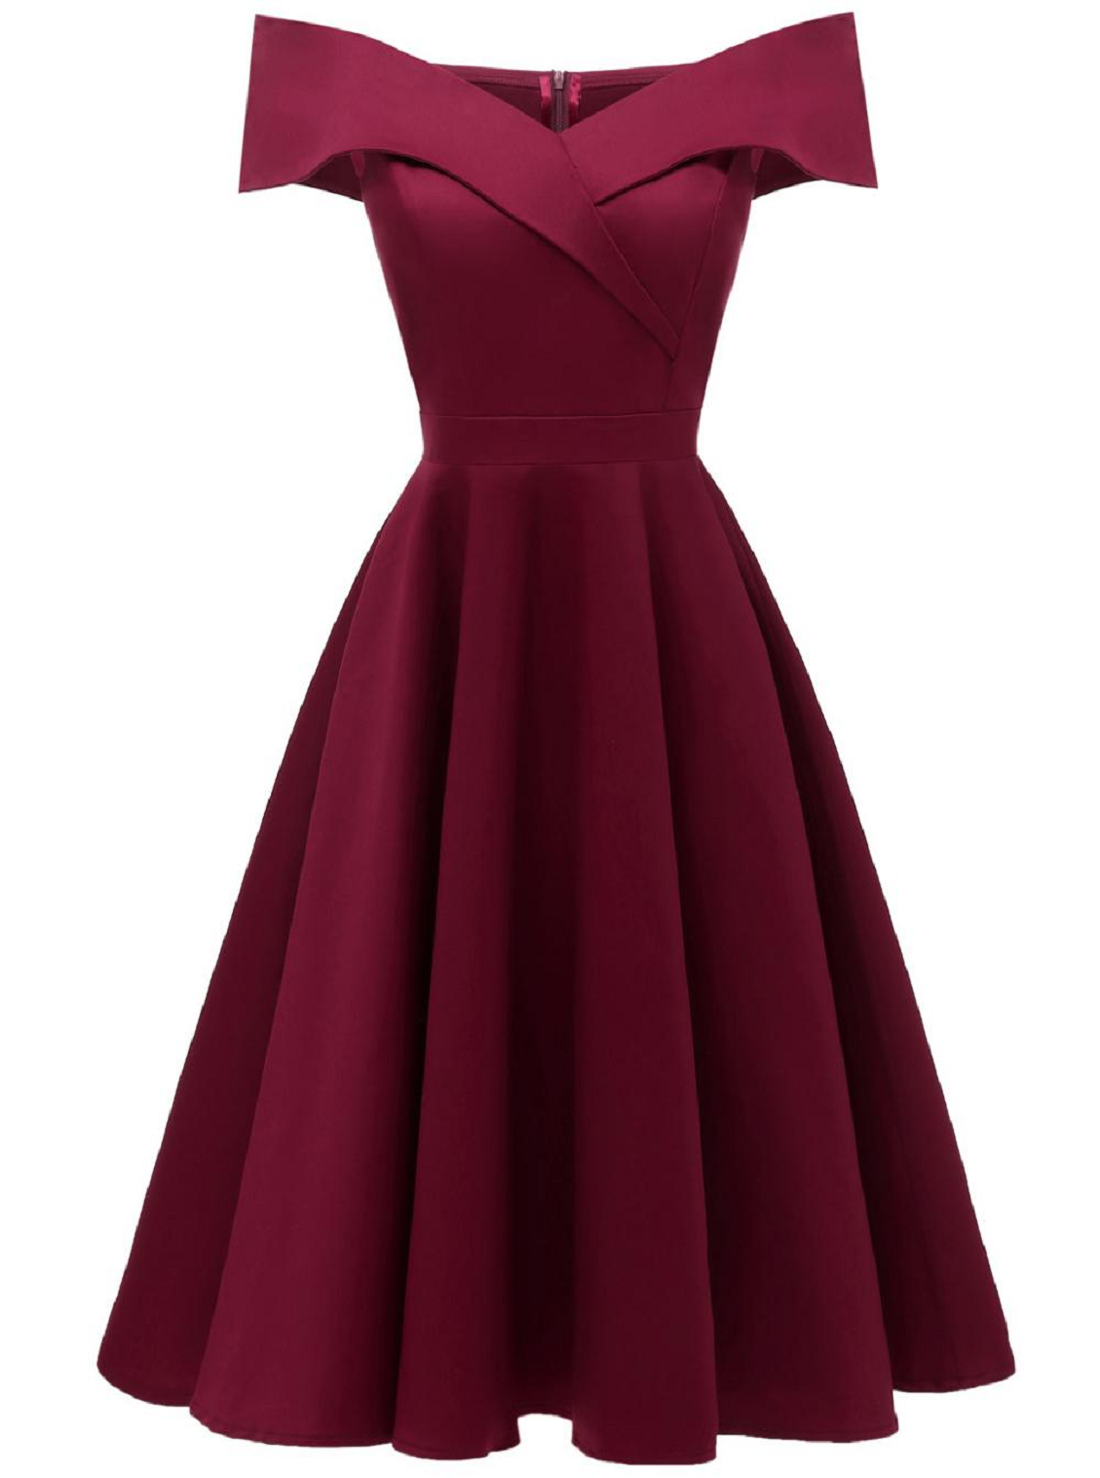 Boat Neck Plus Size Formal Dress